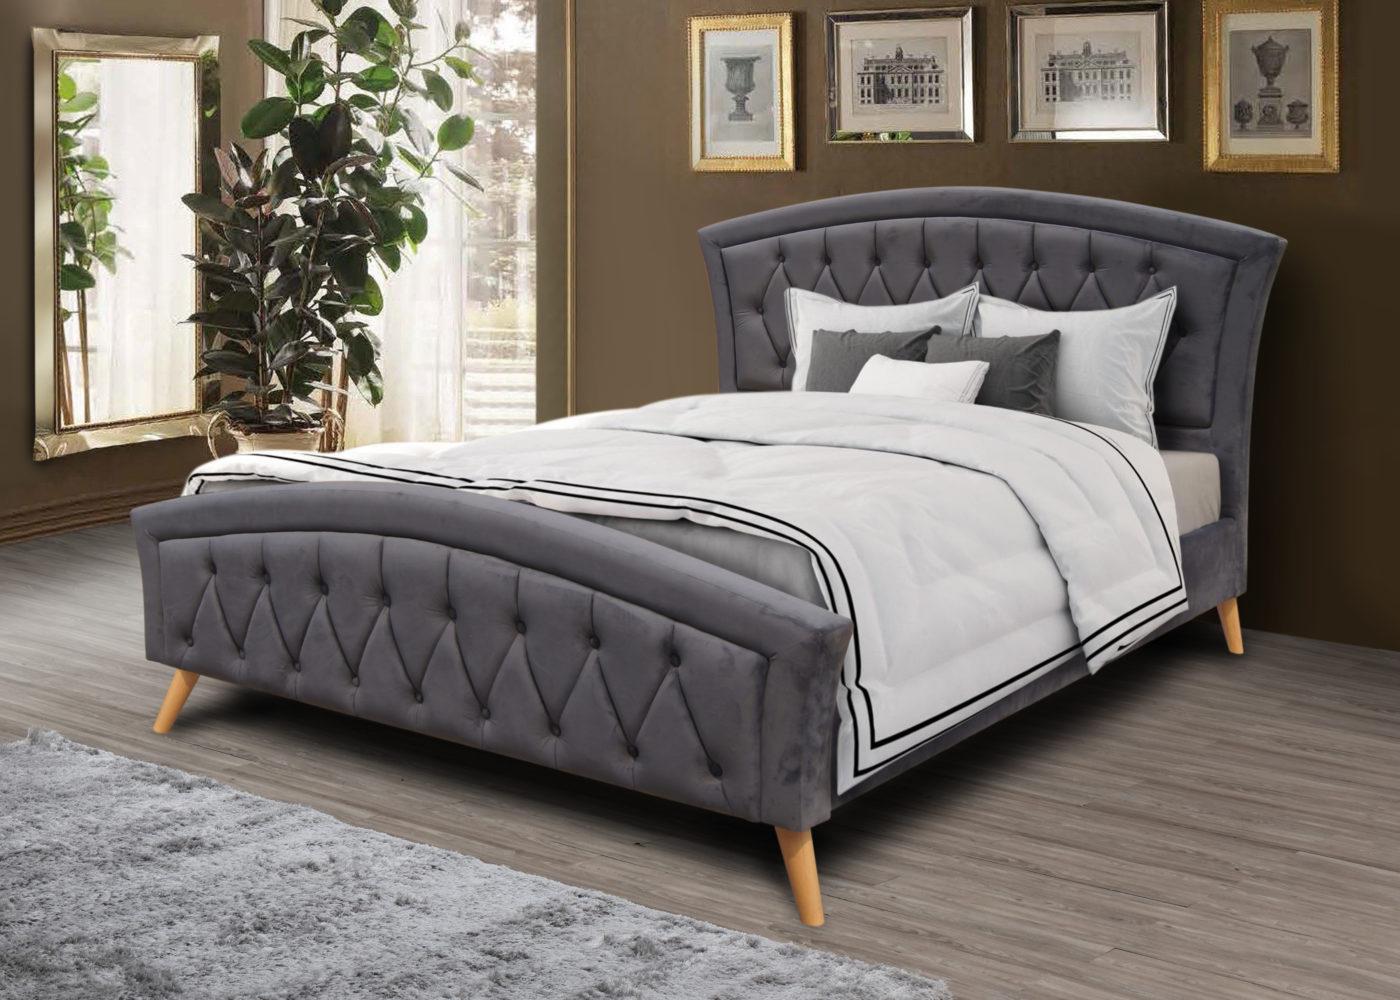 46 Kingston Frame Furniture Designs